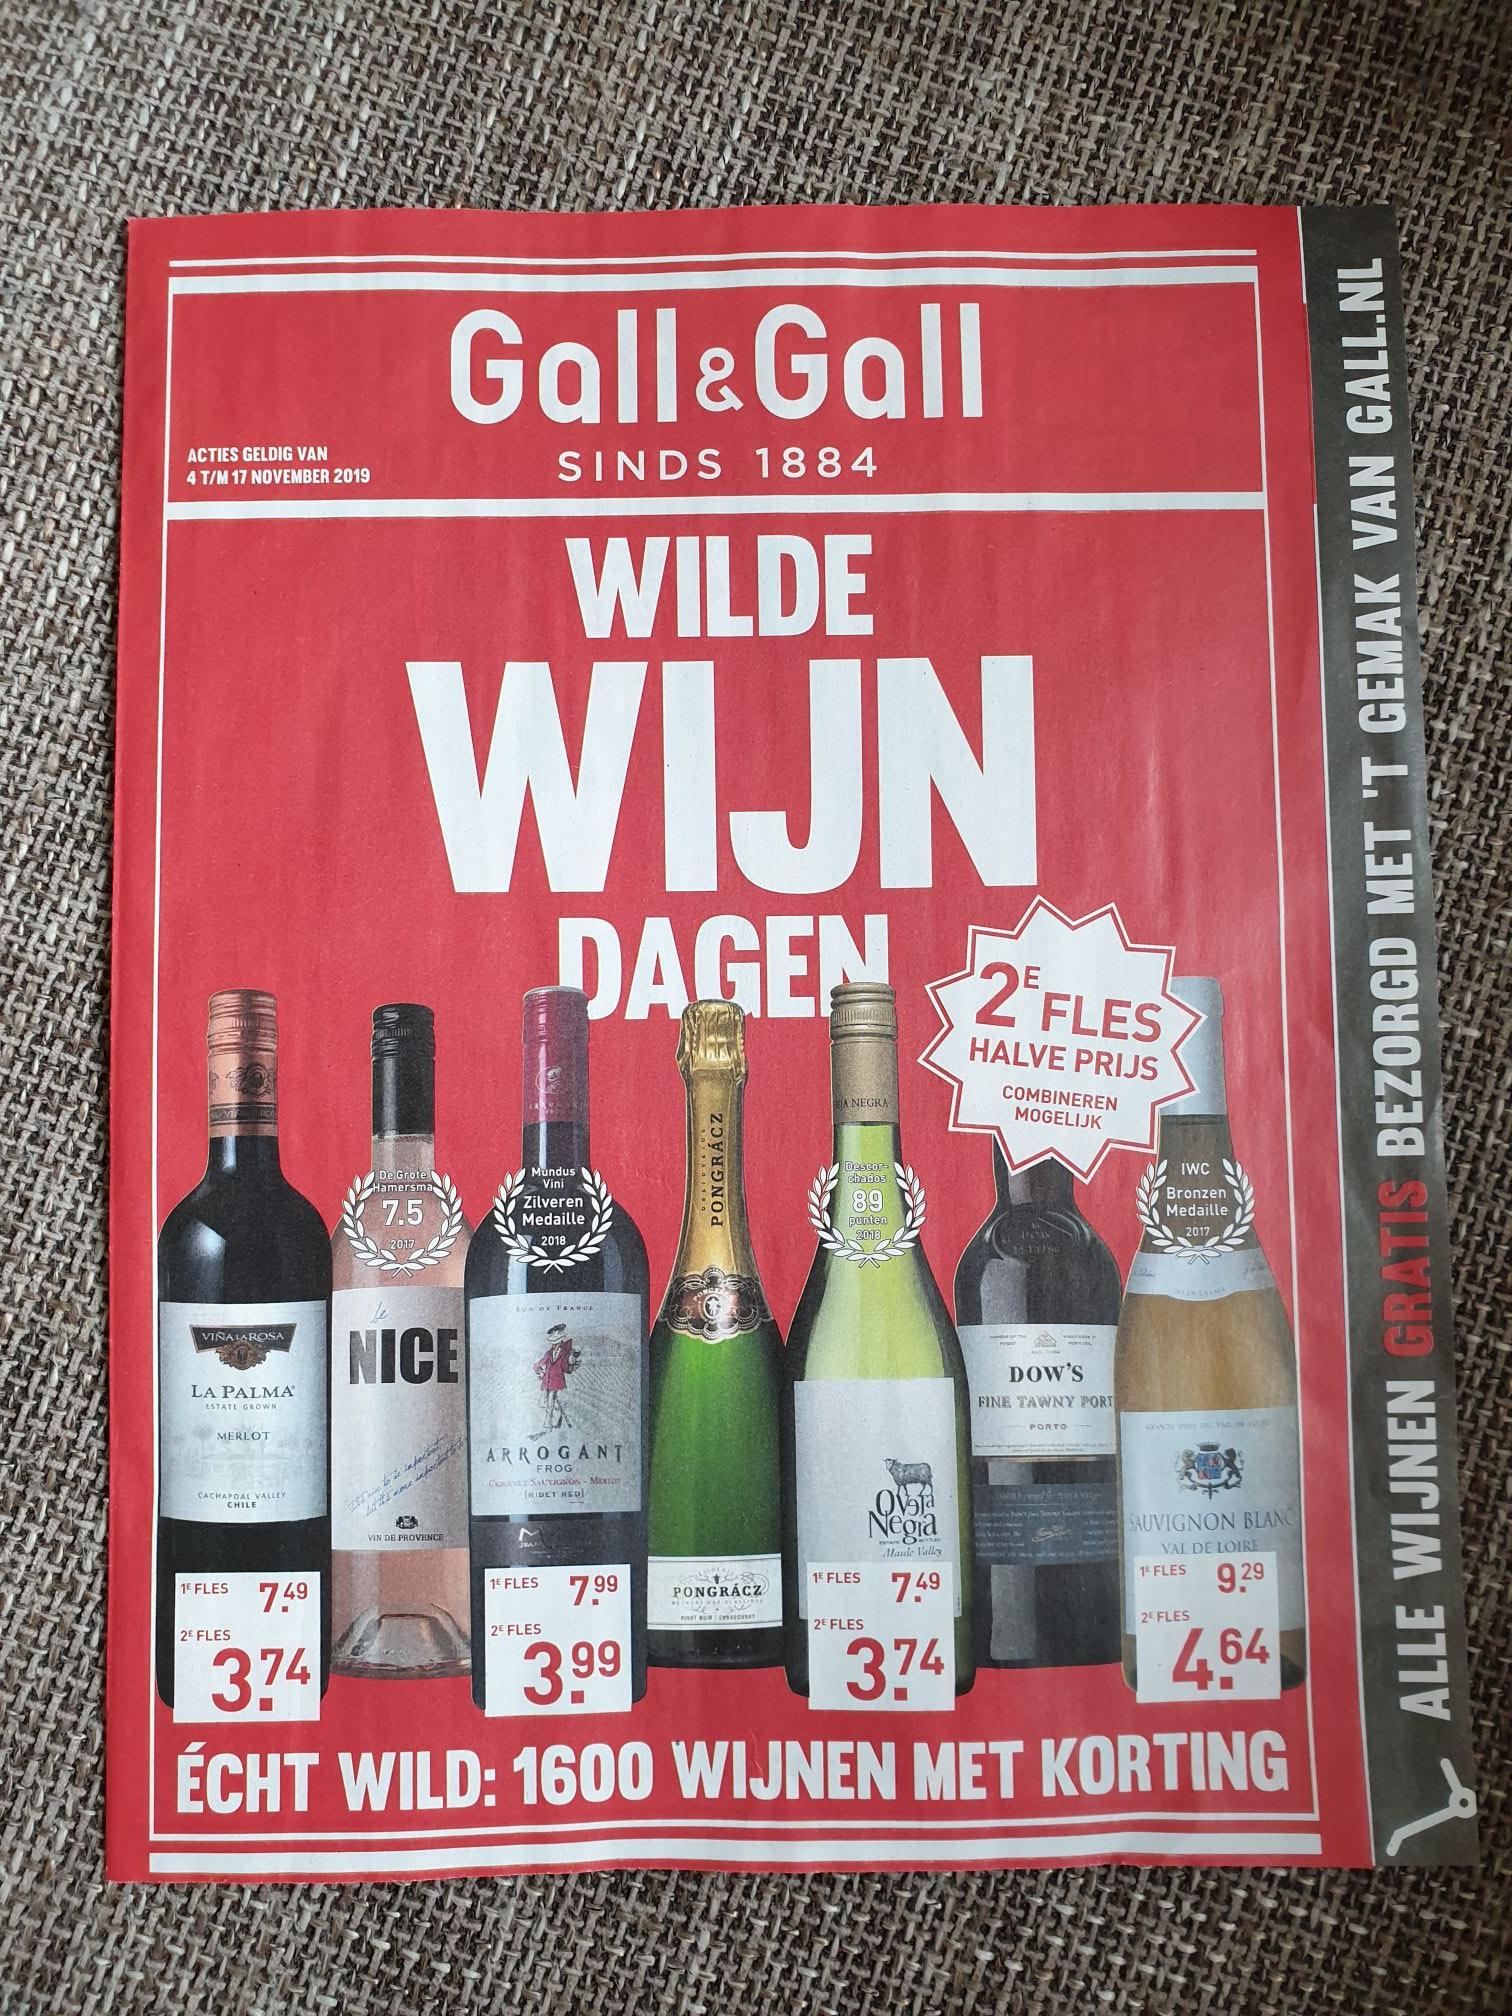 [GALL&GALL] 2e halve prijs!